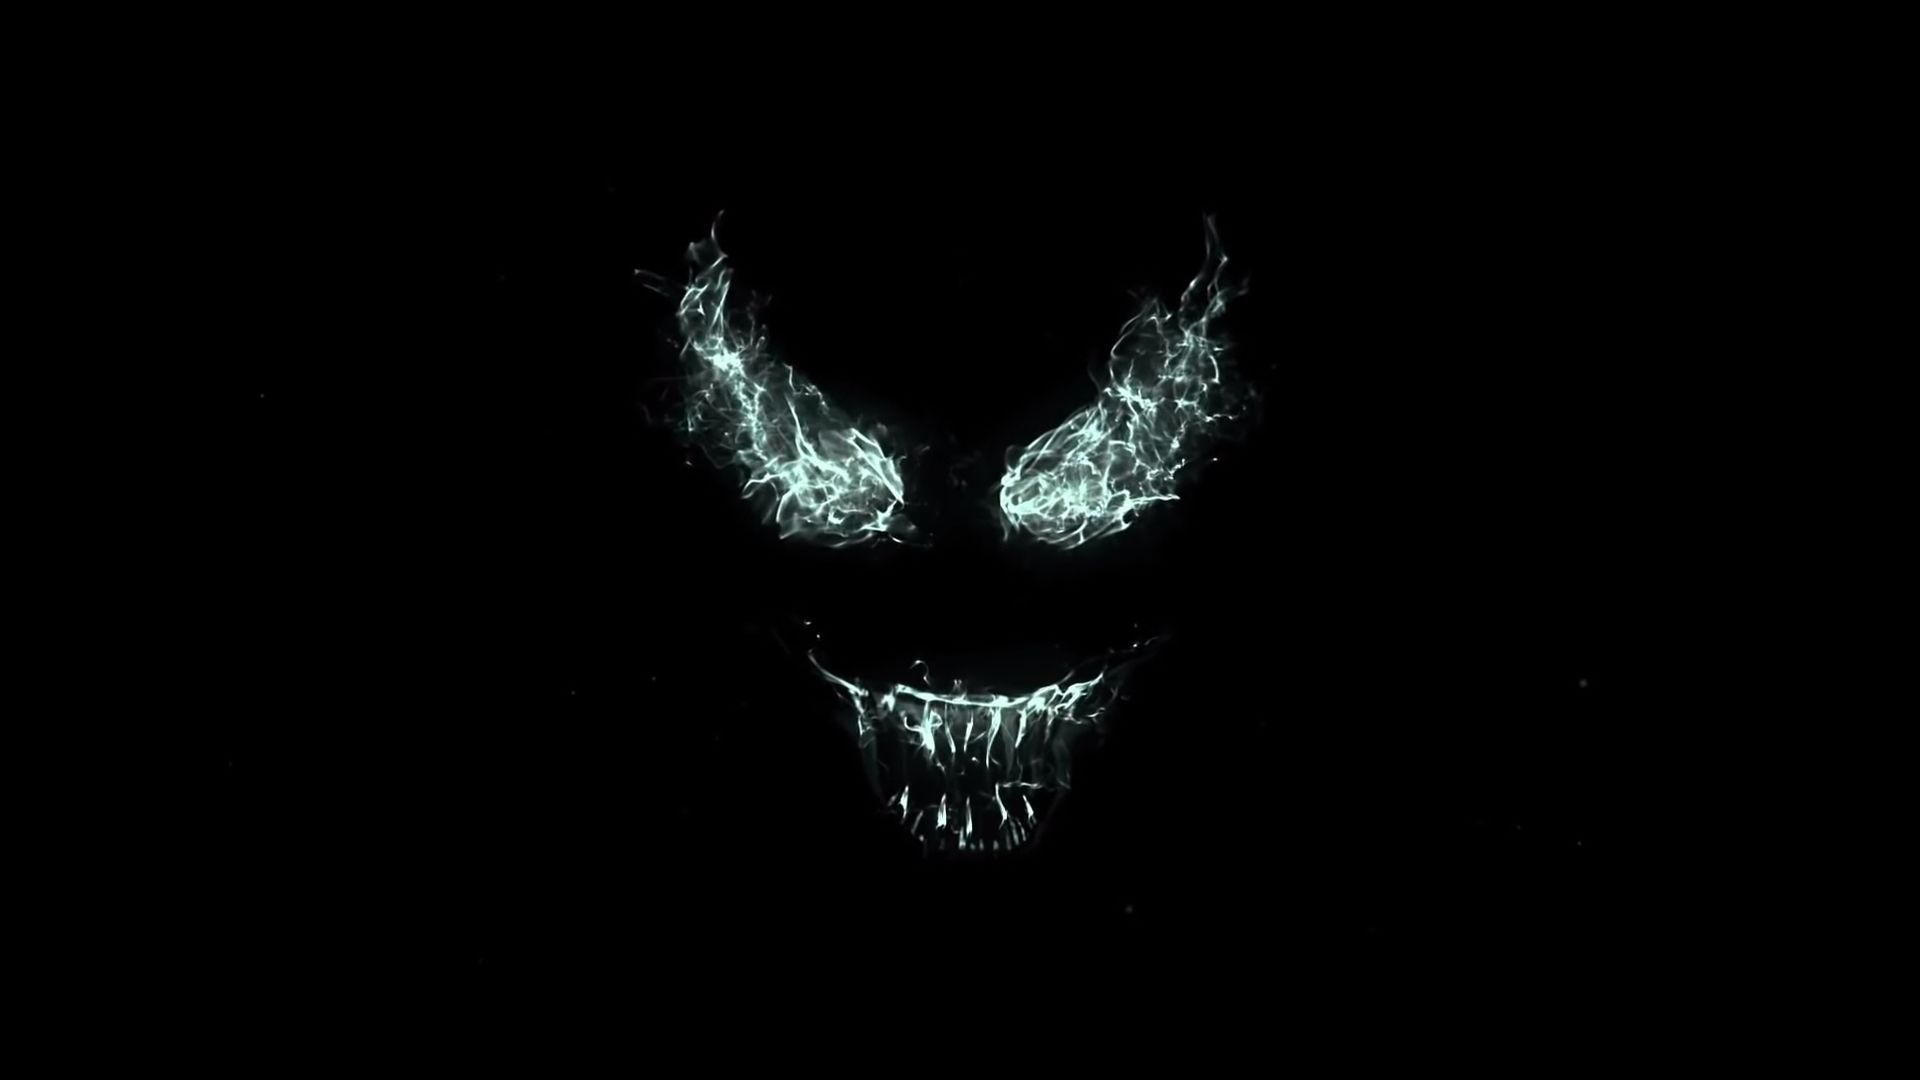 Venom Movie Full HD Laptop Wallpapers - Top Free Venom Movie Full HD